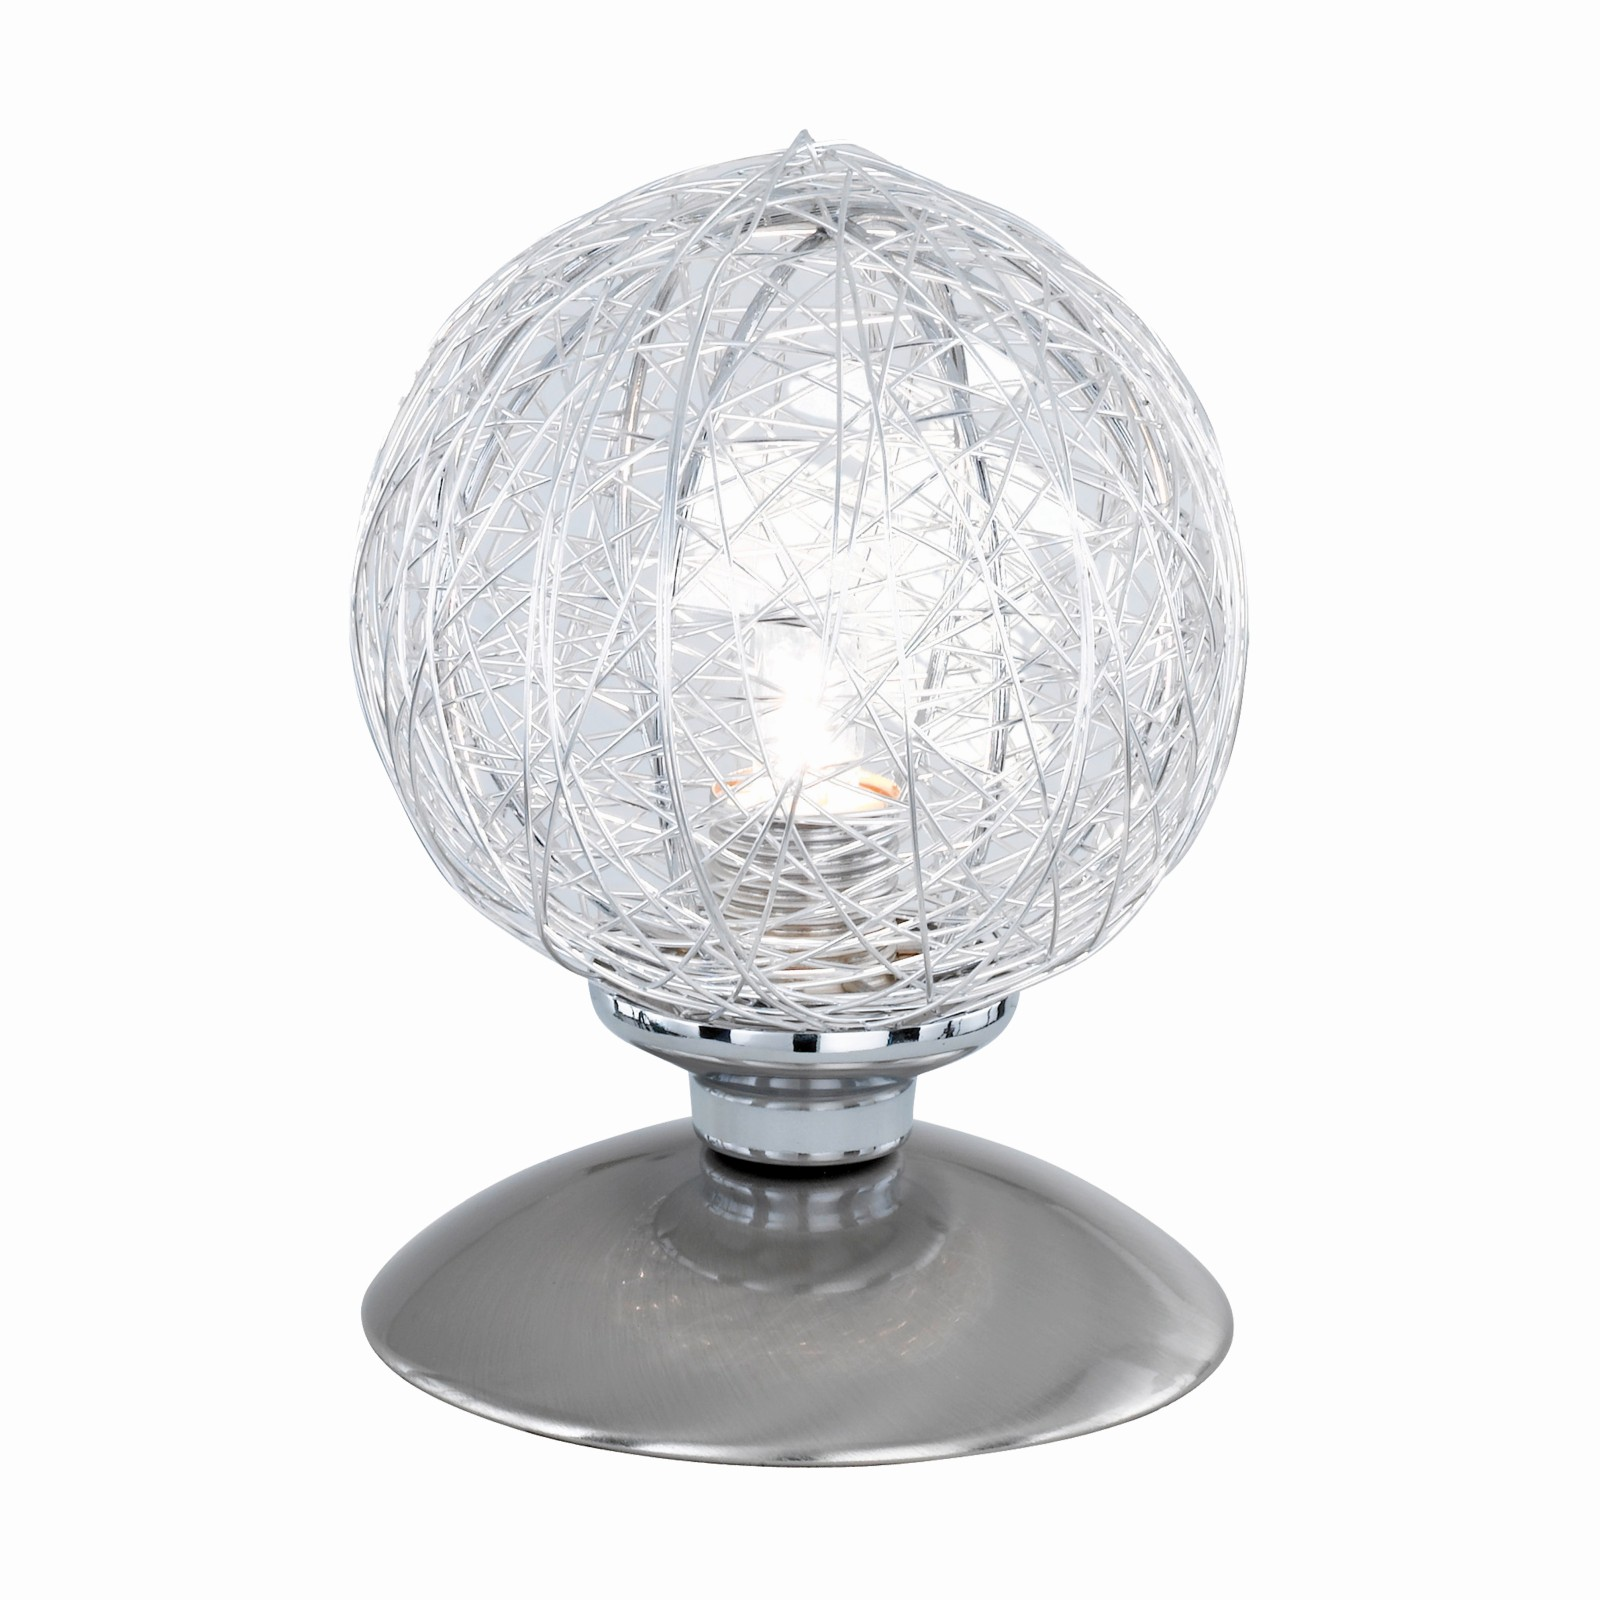 LED Tischleuchte Paul Neuhaus Tino 4025-55 Beistelllampe Stahl G9 3 Watt